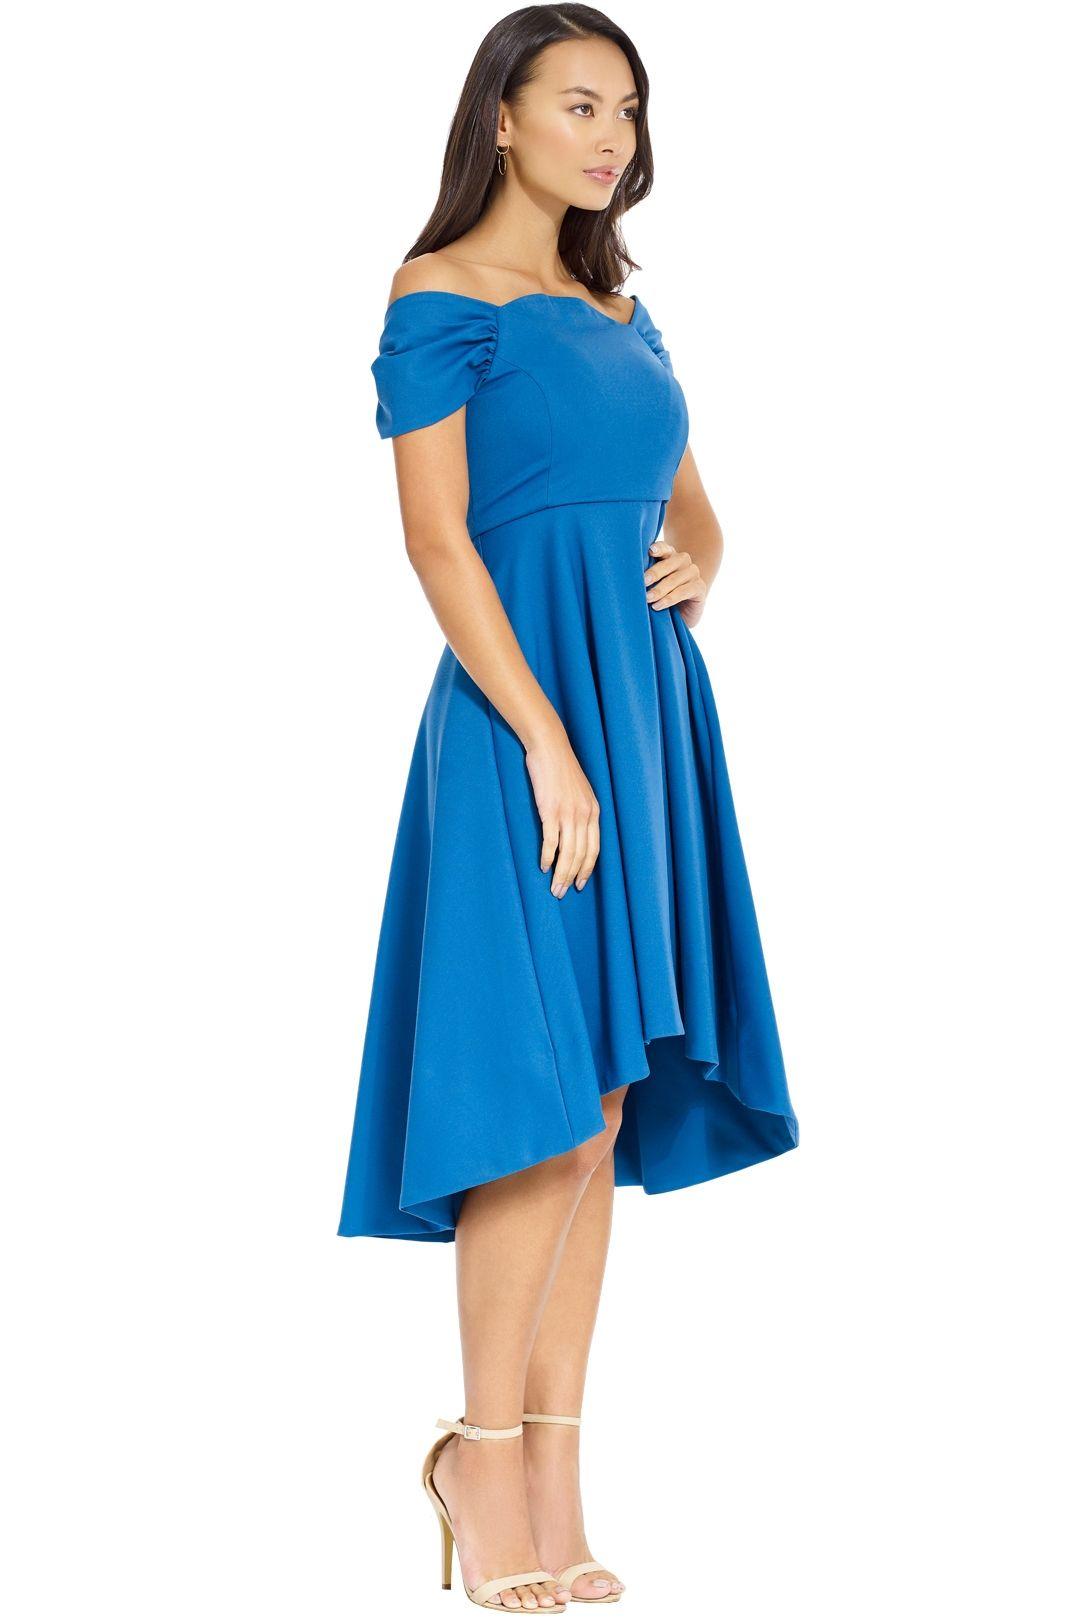 Elliatt - Palace Dress - Blue - Side